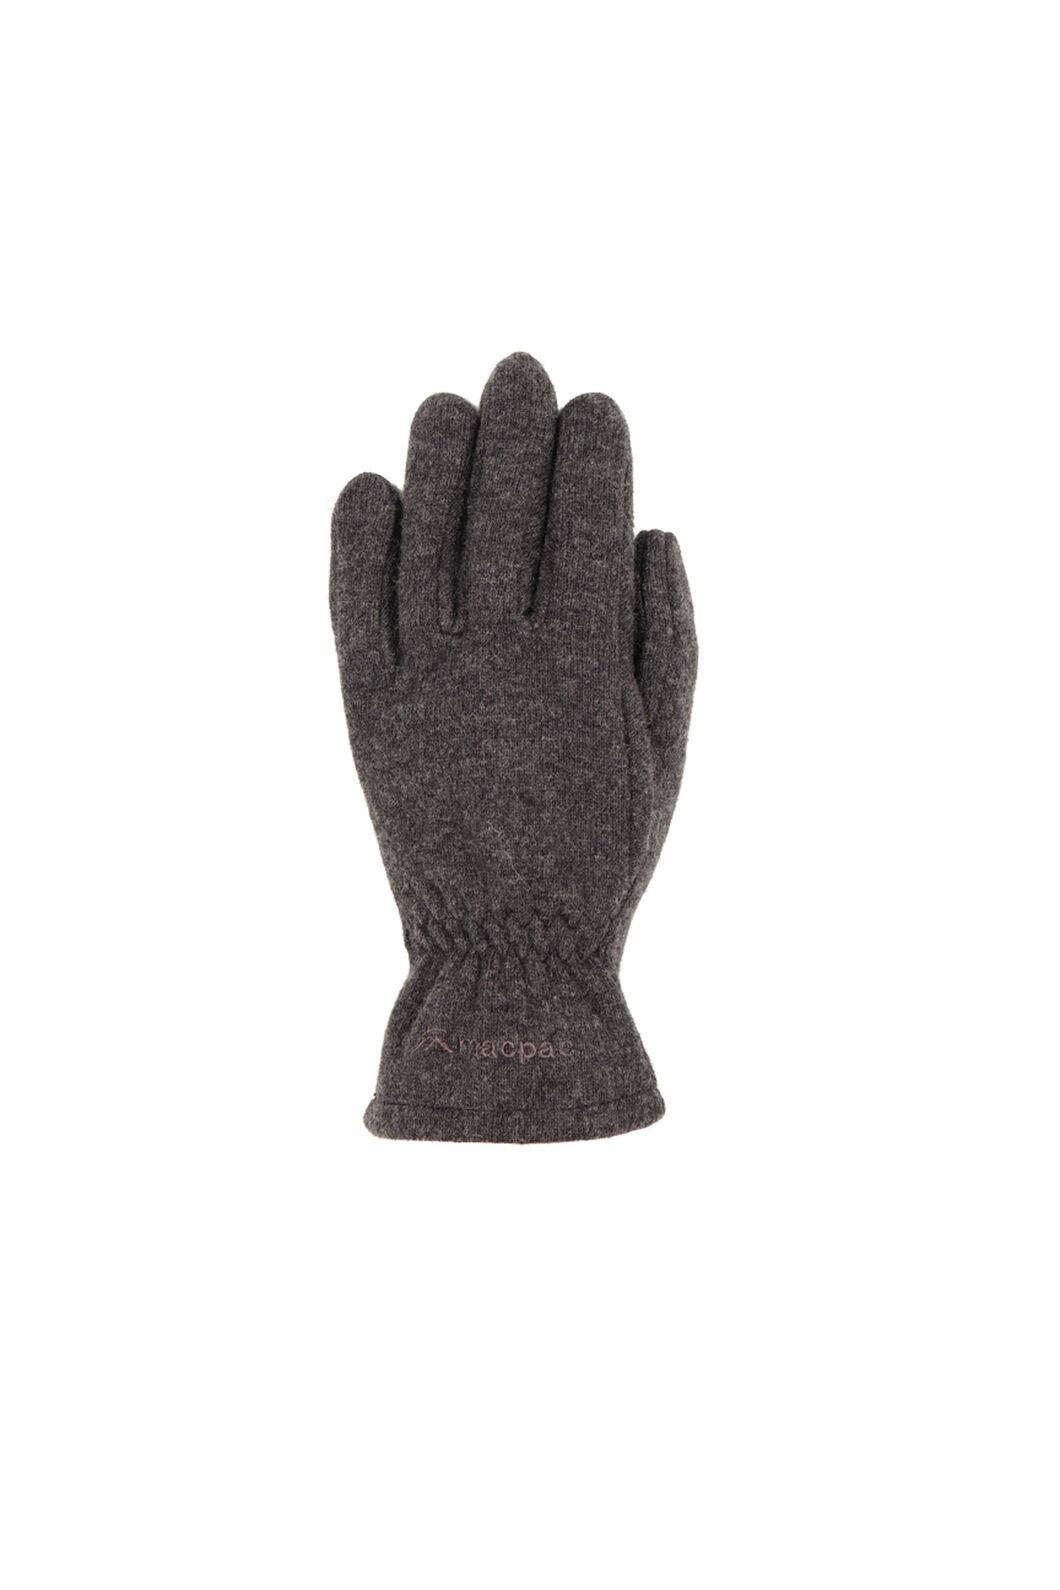 Macpac Tech Wool Gloves, Charcoal, hi-res